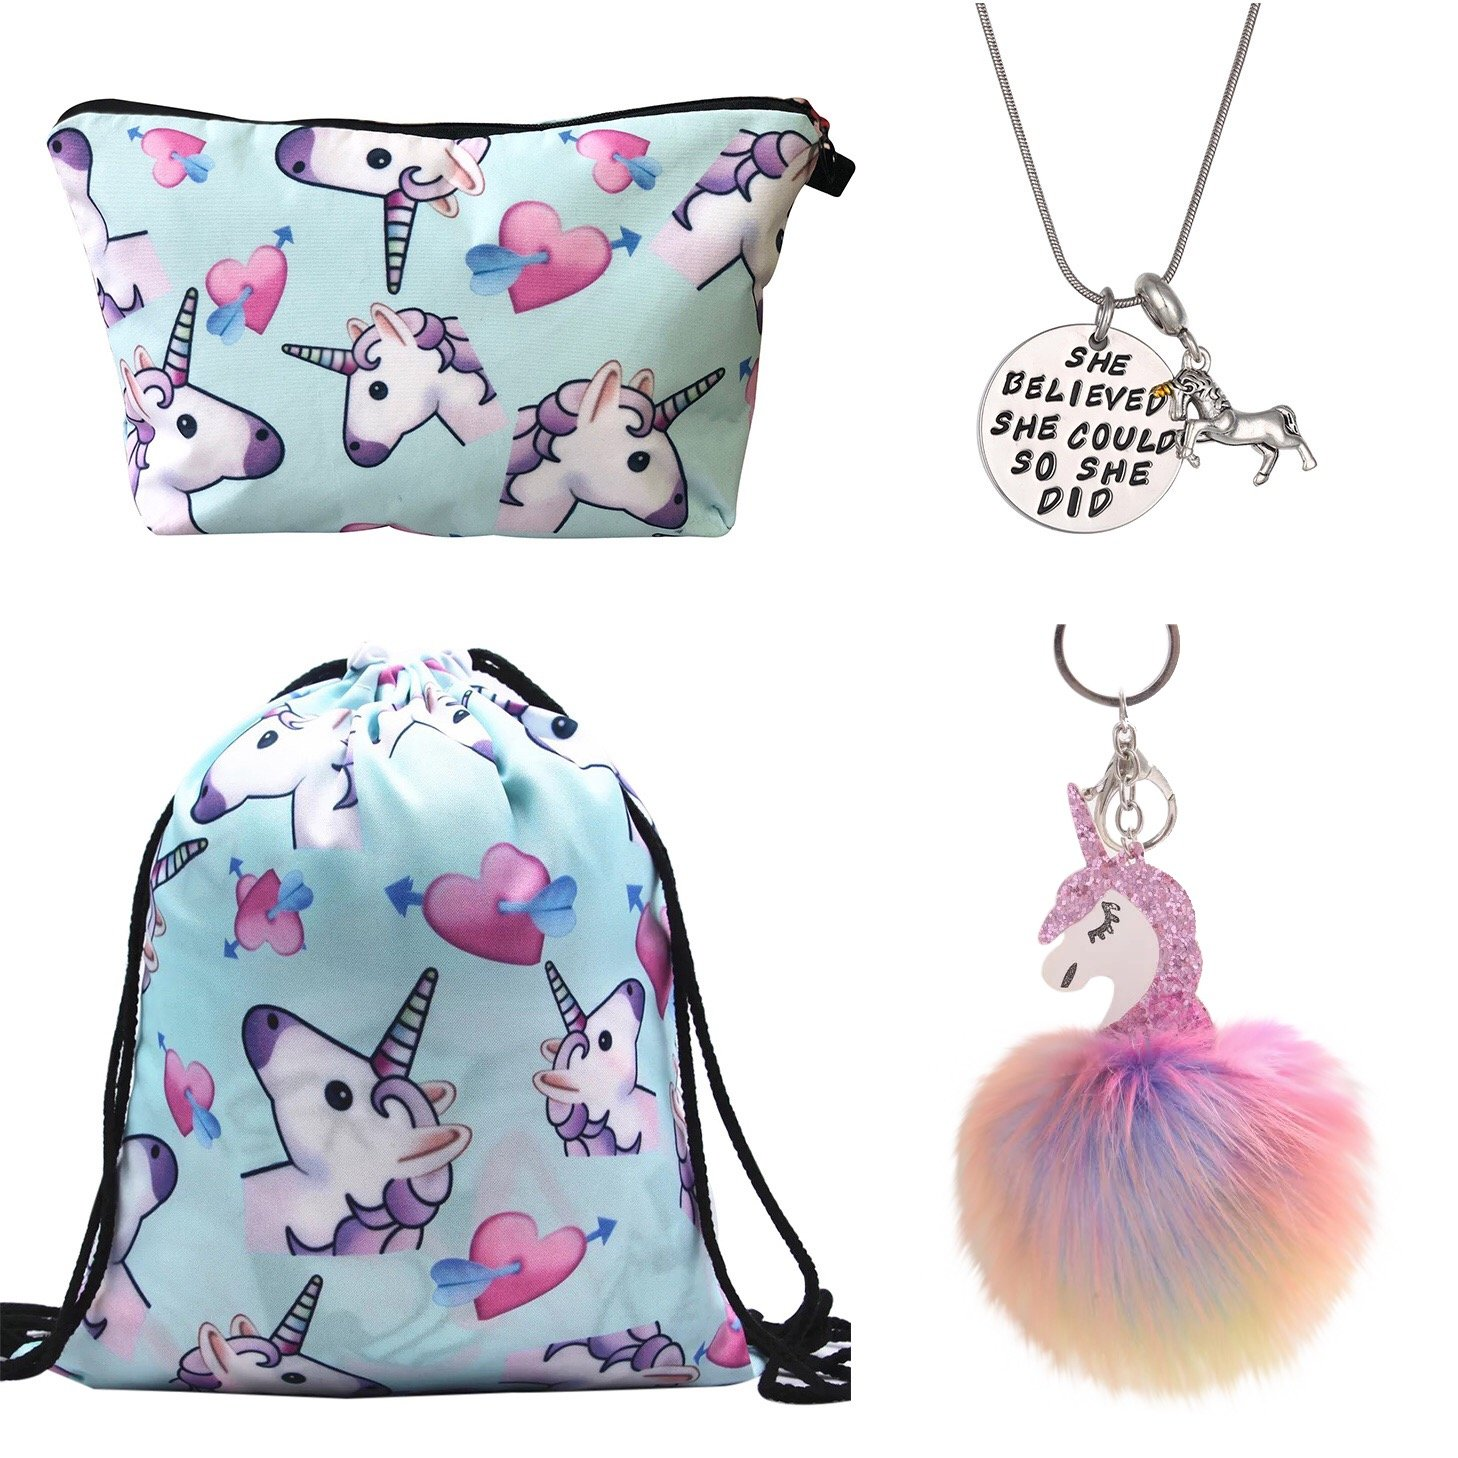 Unicorn Gifts for Girls 4 Pack - Unicorn Drawstring Backpack/Makeup Bag/Necklace/Fluffy Keyring (Blue)